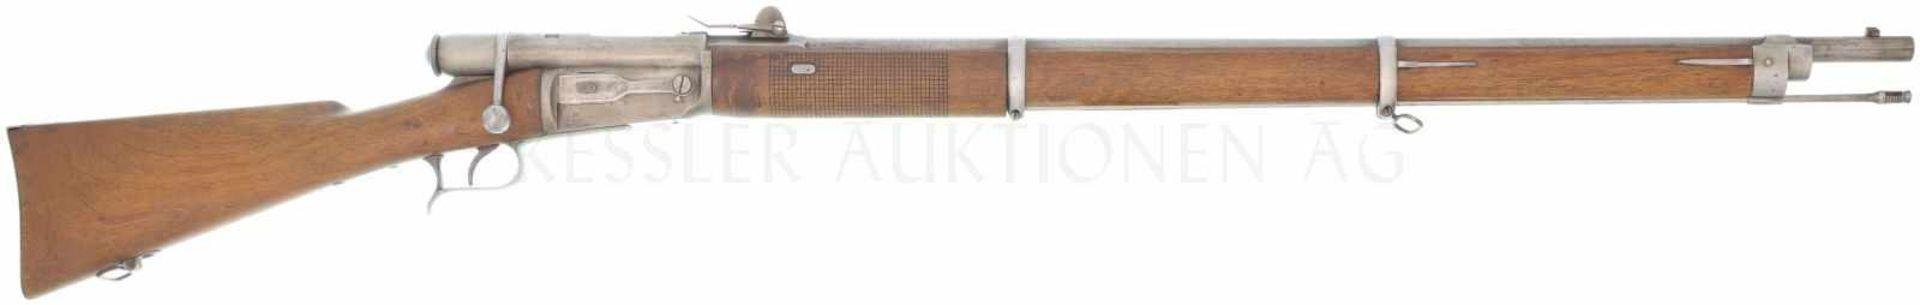 Repetiergewehr, W. v. Steiger, Thun, Vetterli M 1869/70, Kal. 10.4RFmm LL 840mm, TL 1300mm,